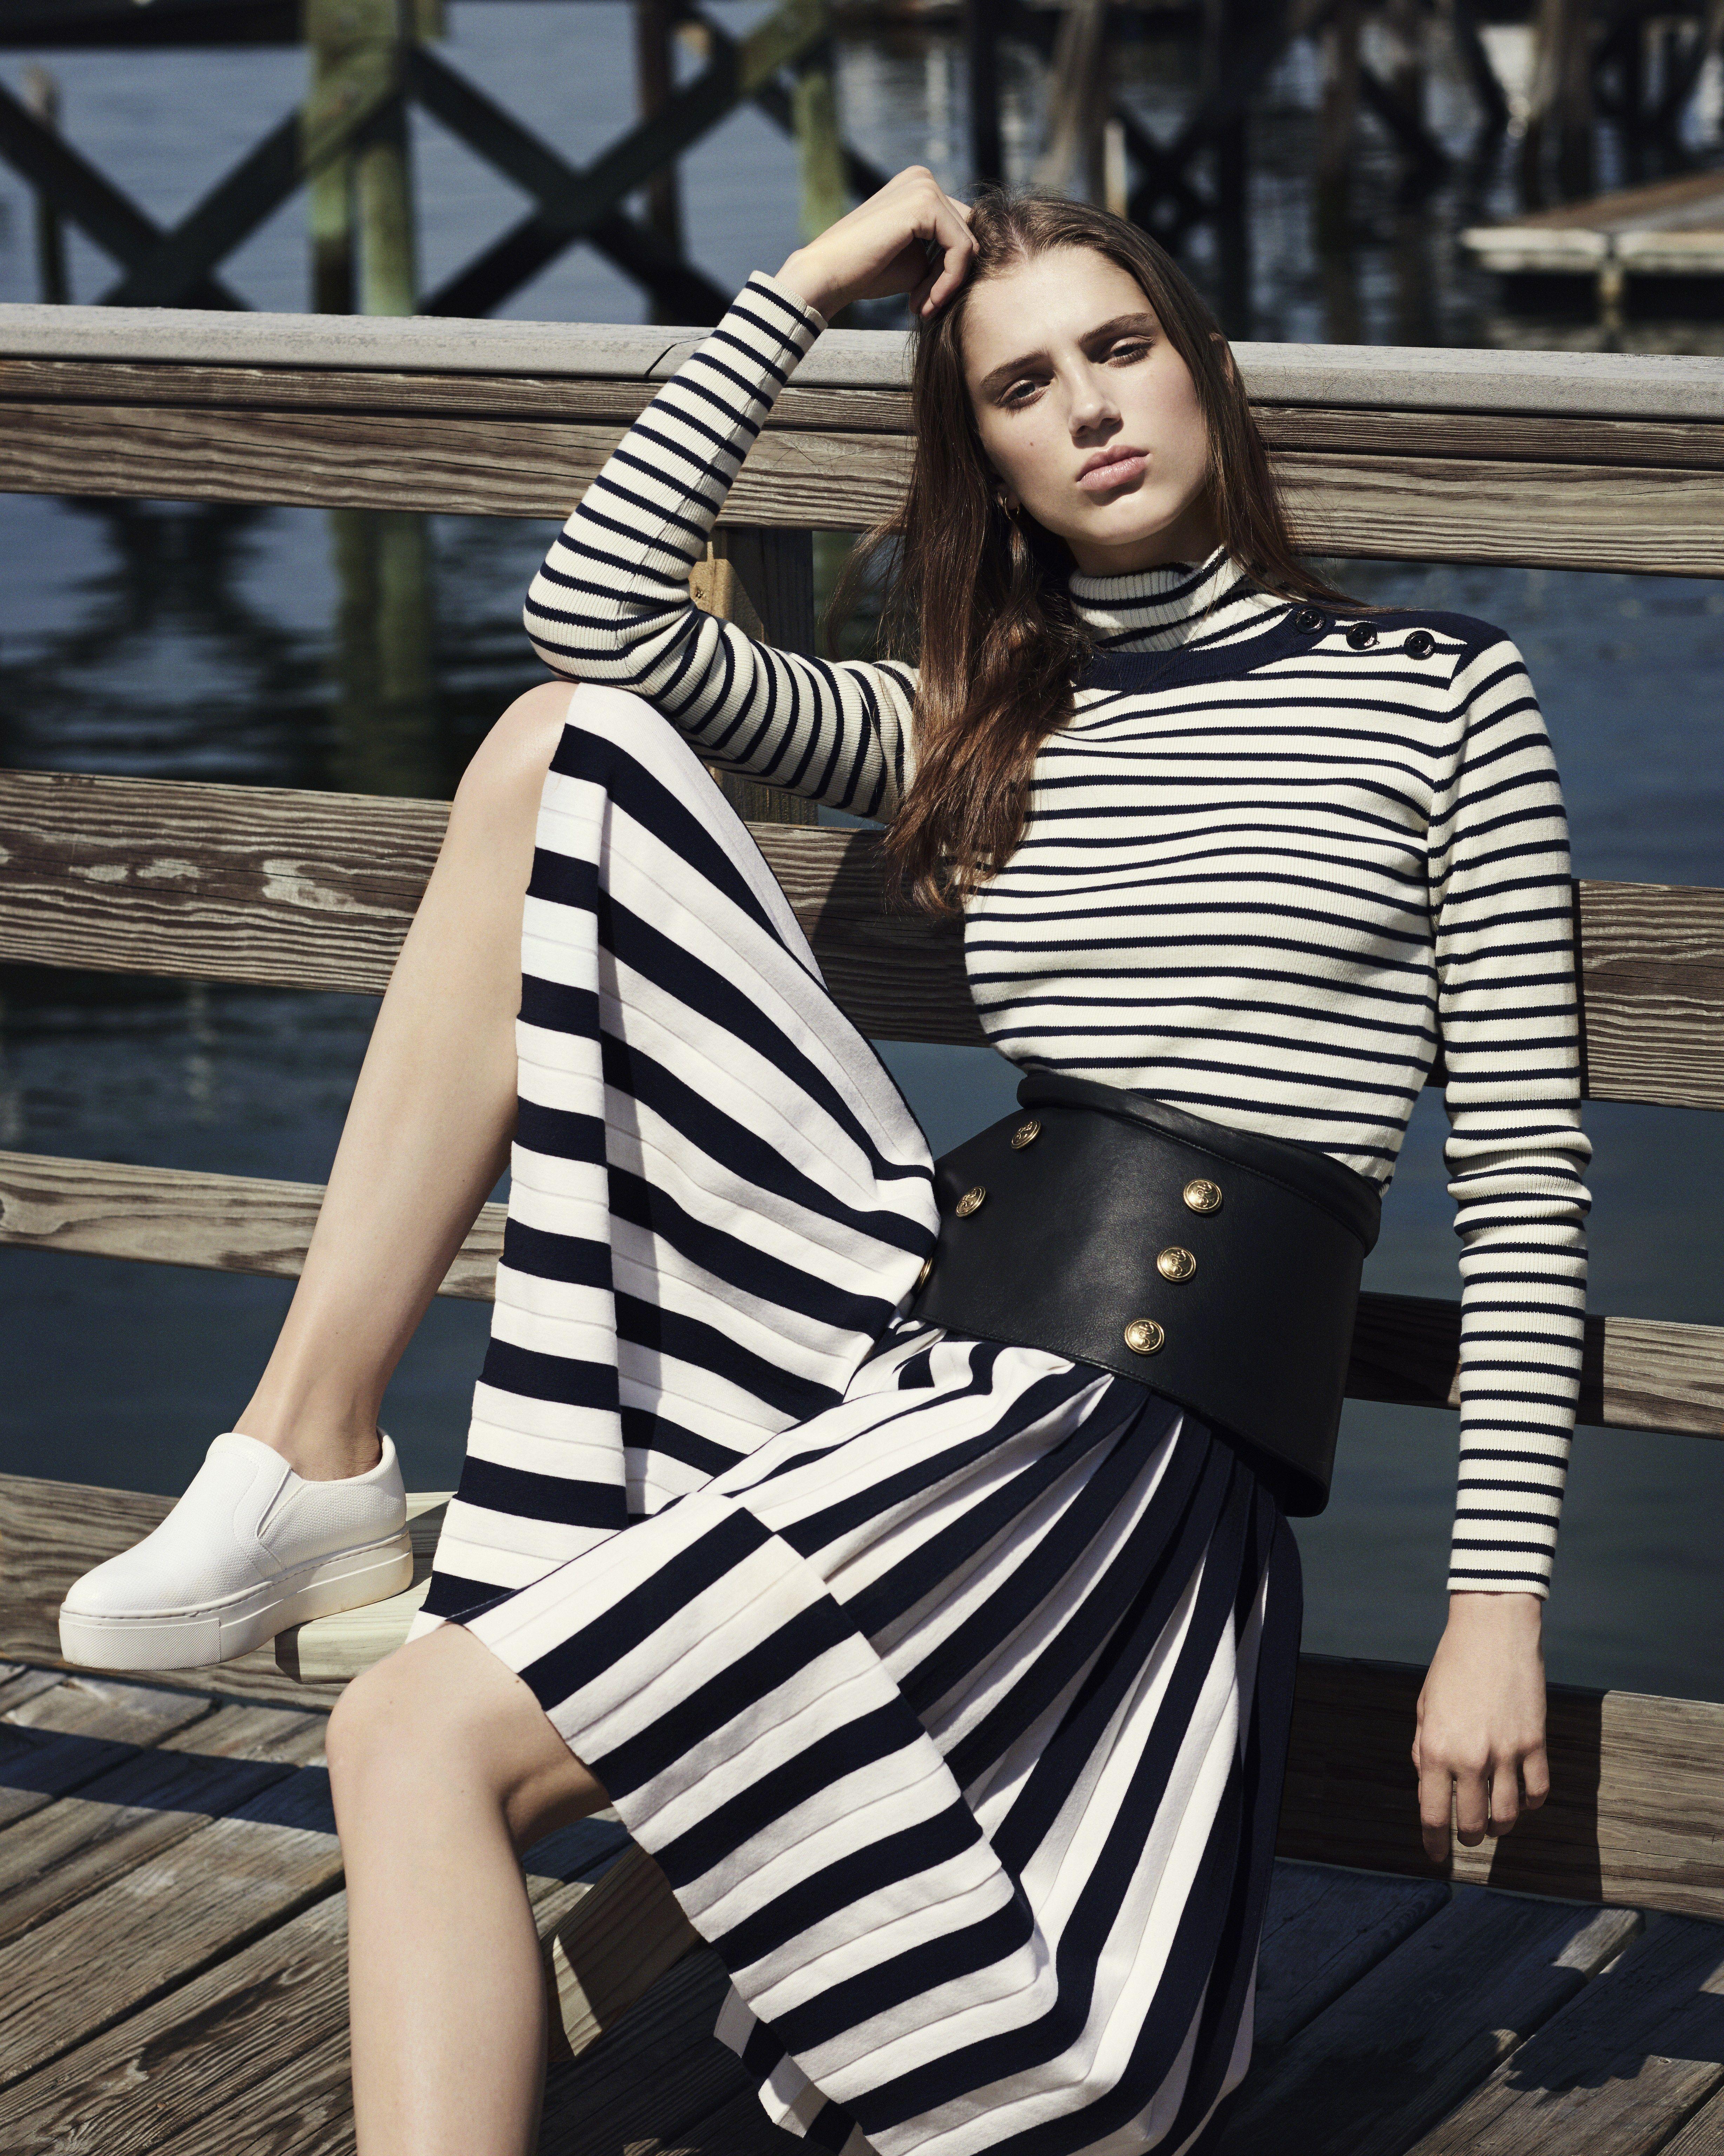 2019 year lifestyle- Nautical trend stripes